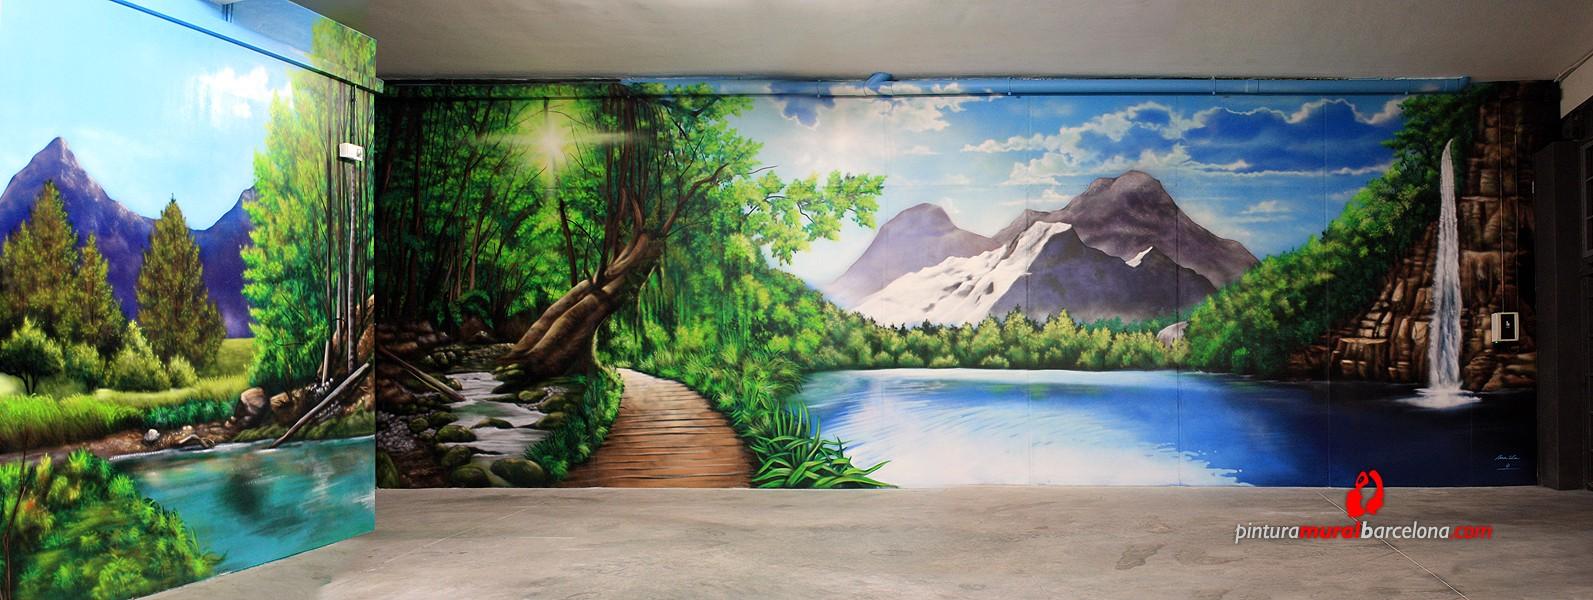 paisaje 3d mural bosque pintura mural barcelona mateo